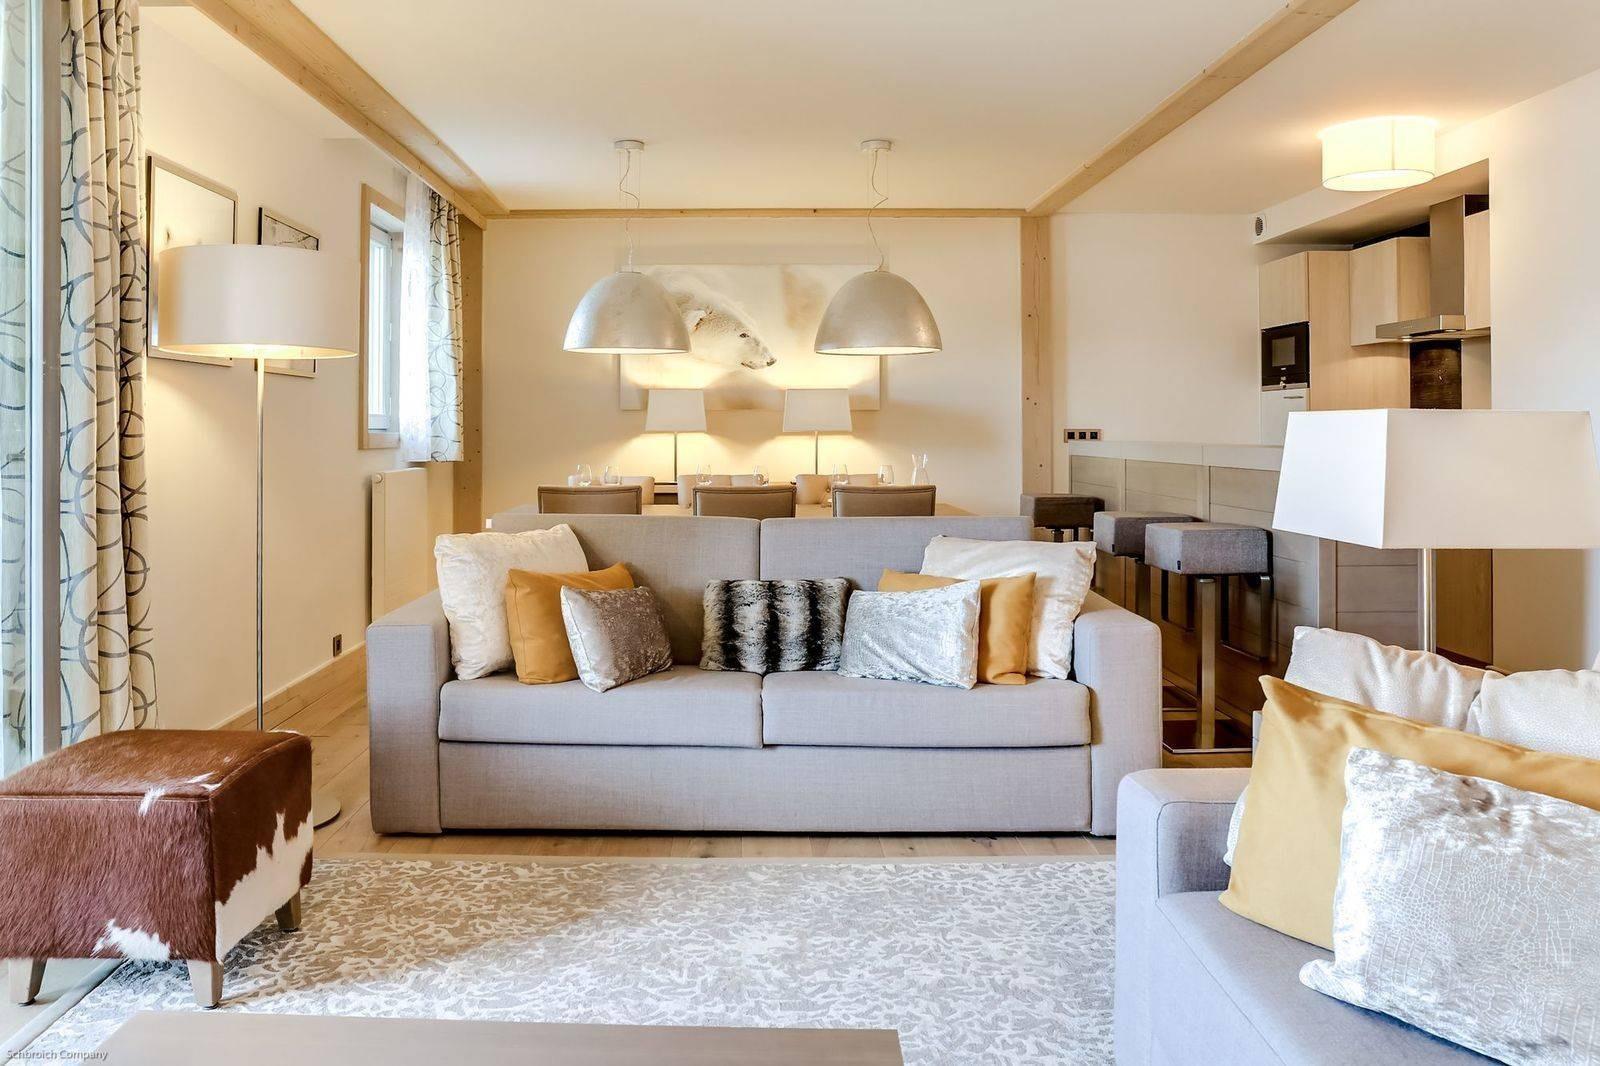 Courchevel 1550 Luxury Rental Appartment Telamite Living Room 4